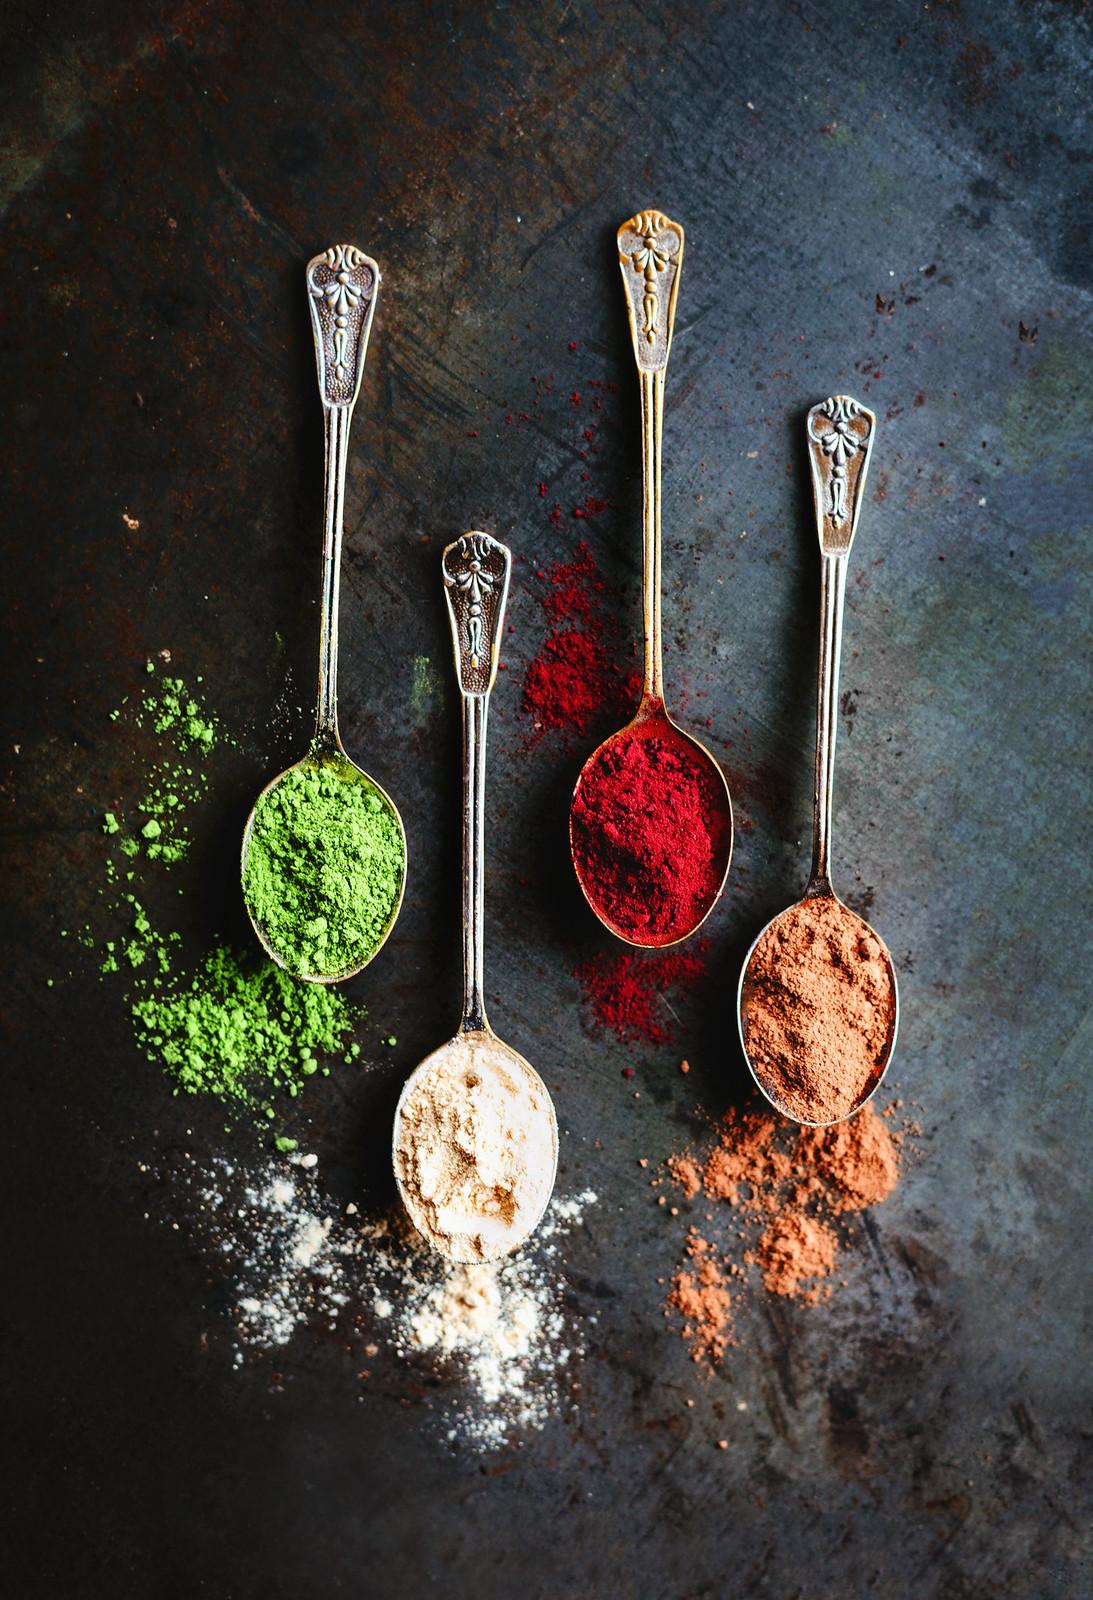 Superfood-pulver från Kryddtorget.se - Evelinas Ekologiska